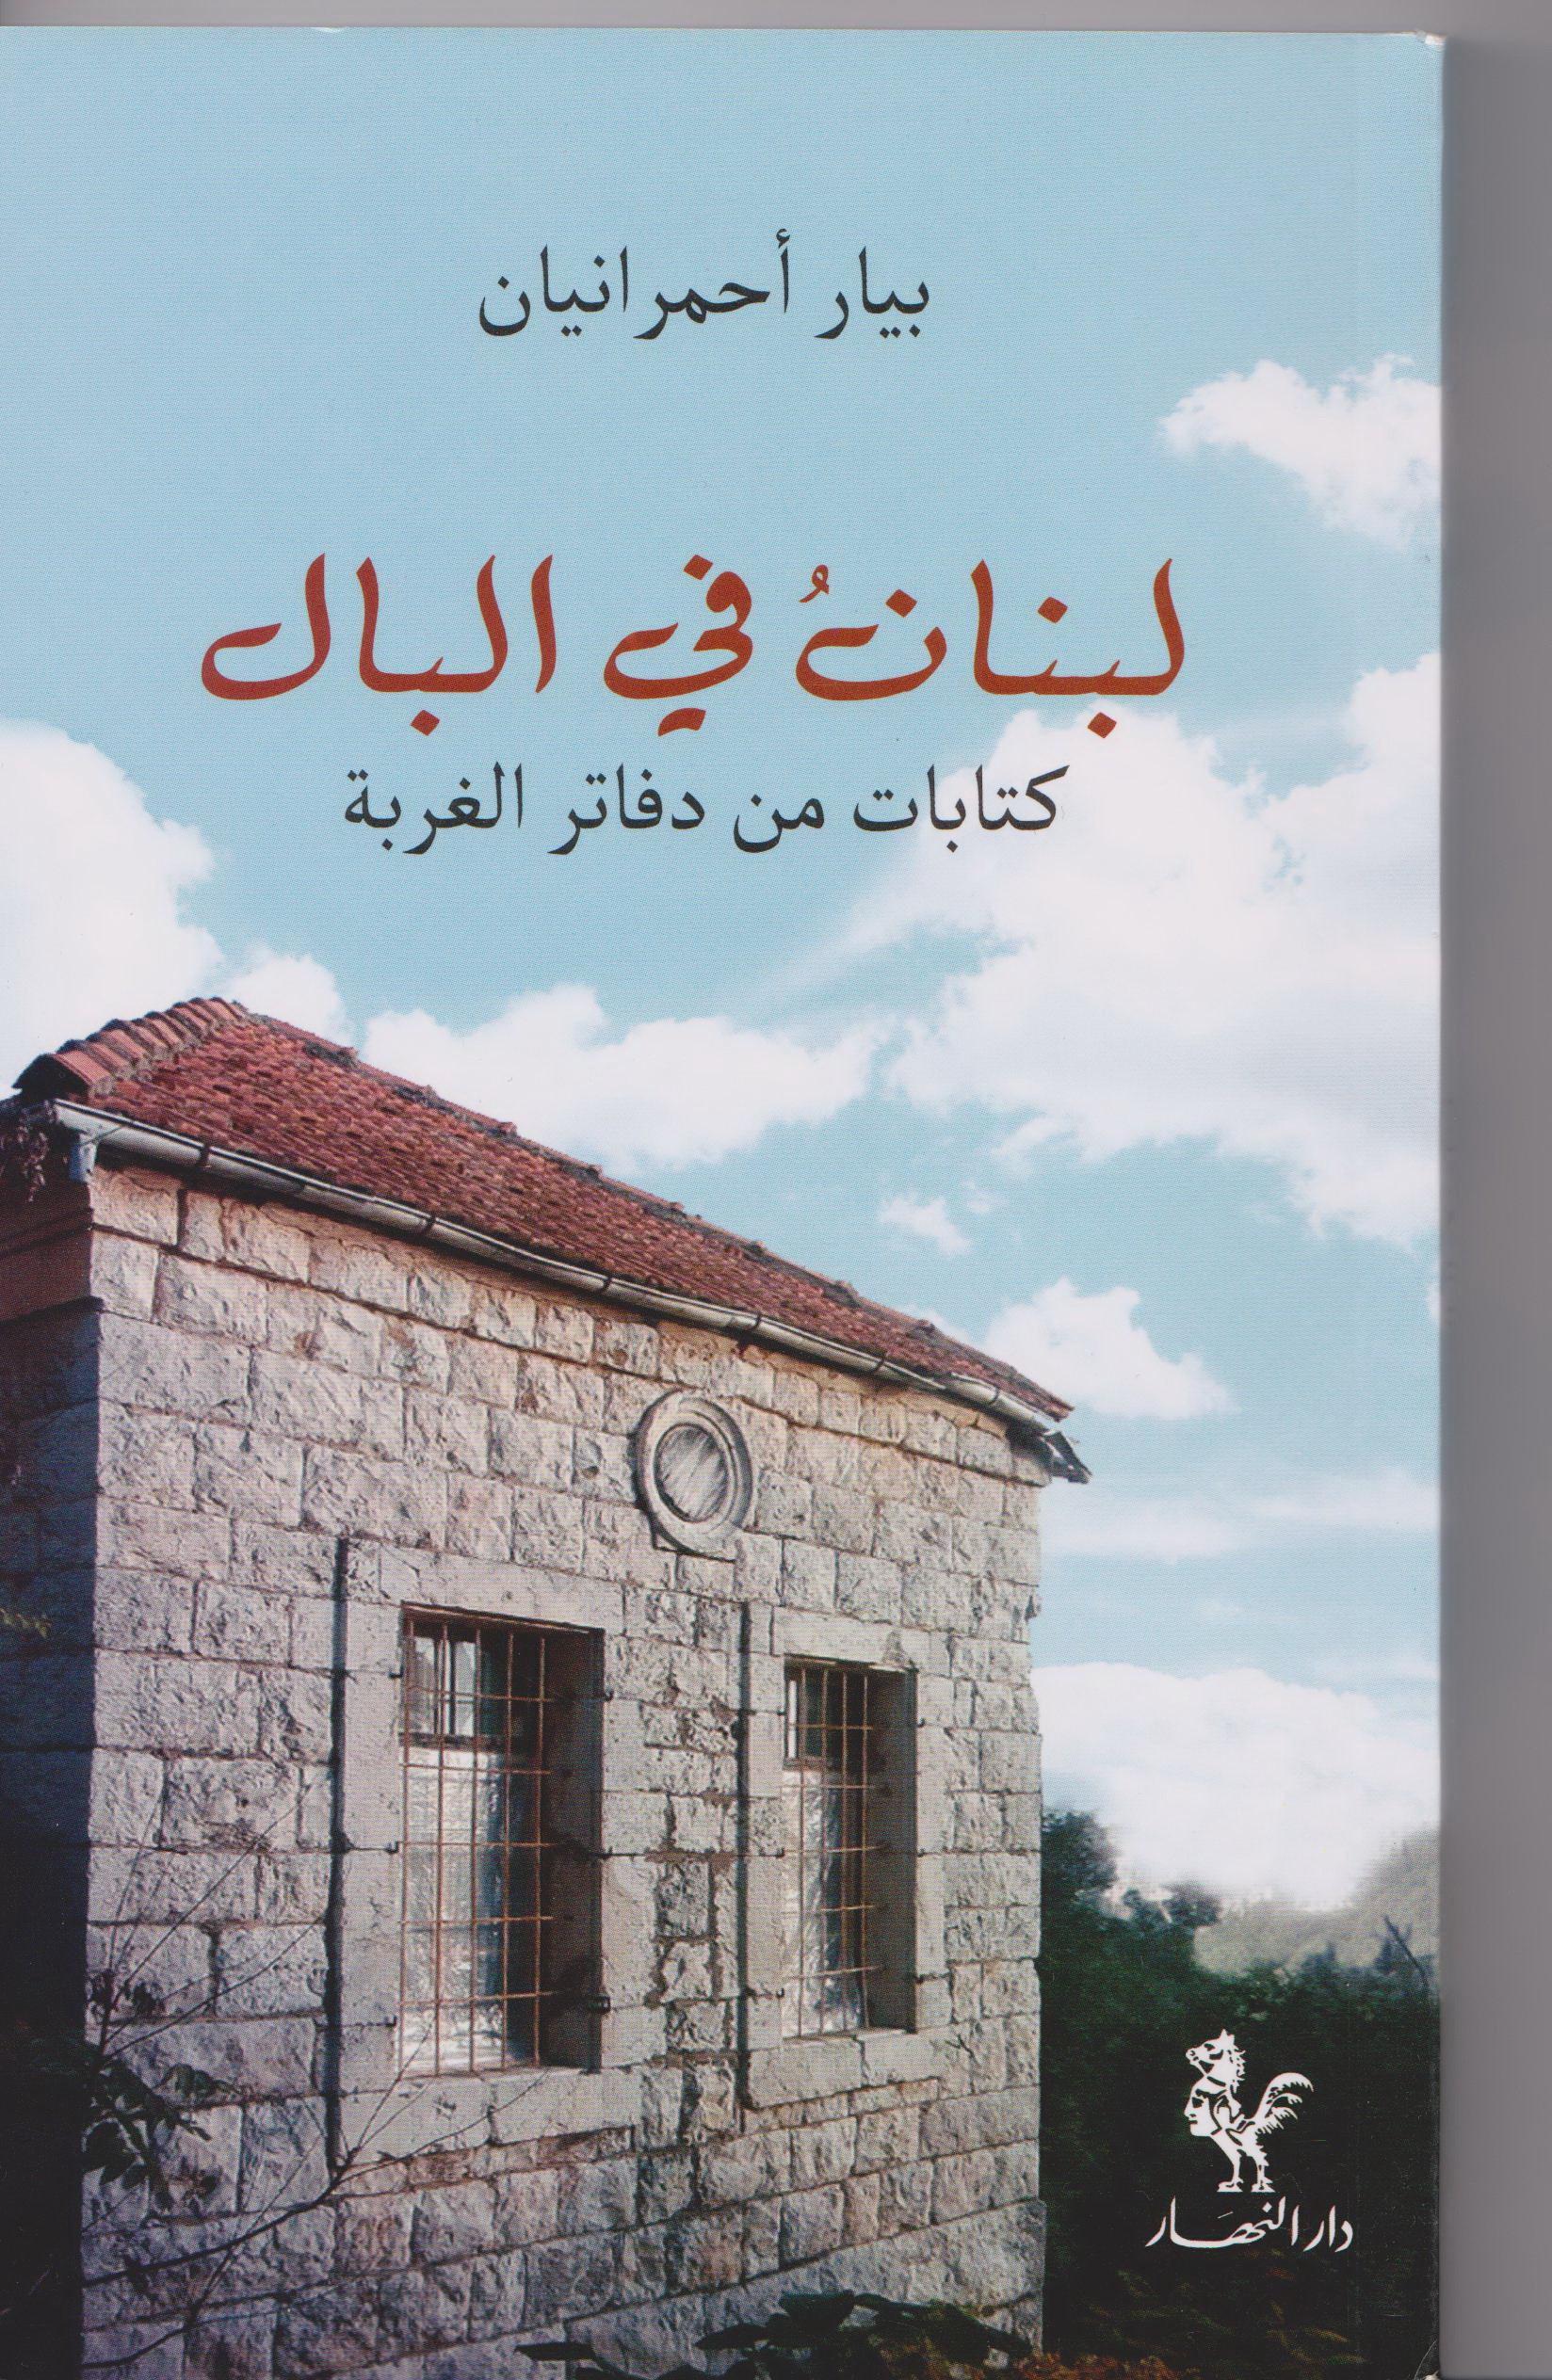 pierre ahmaranian cover book